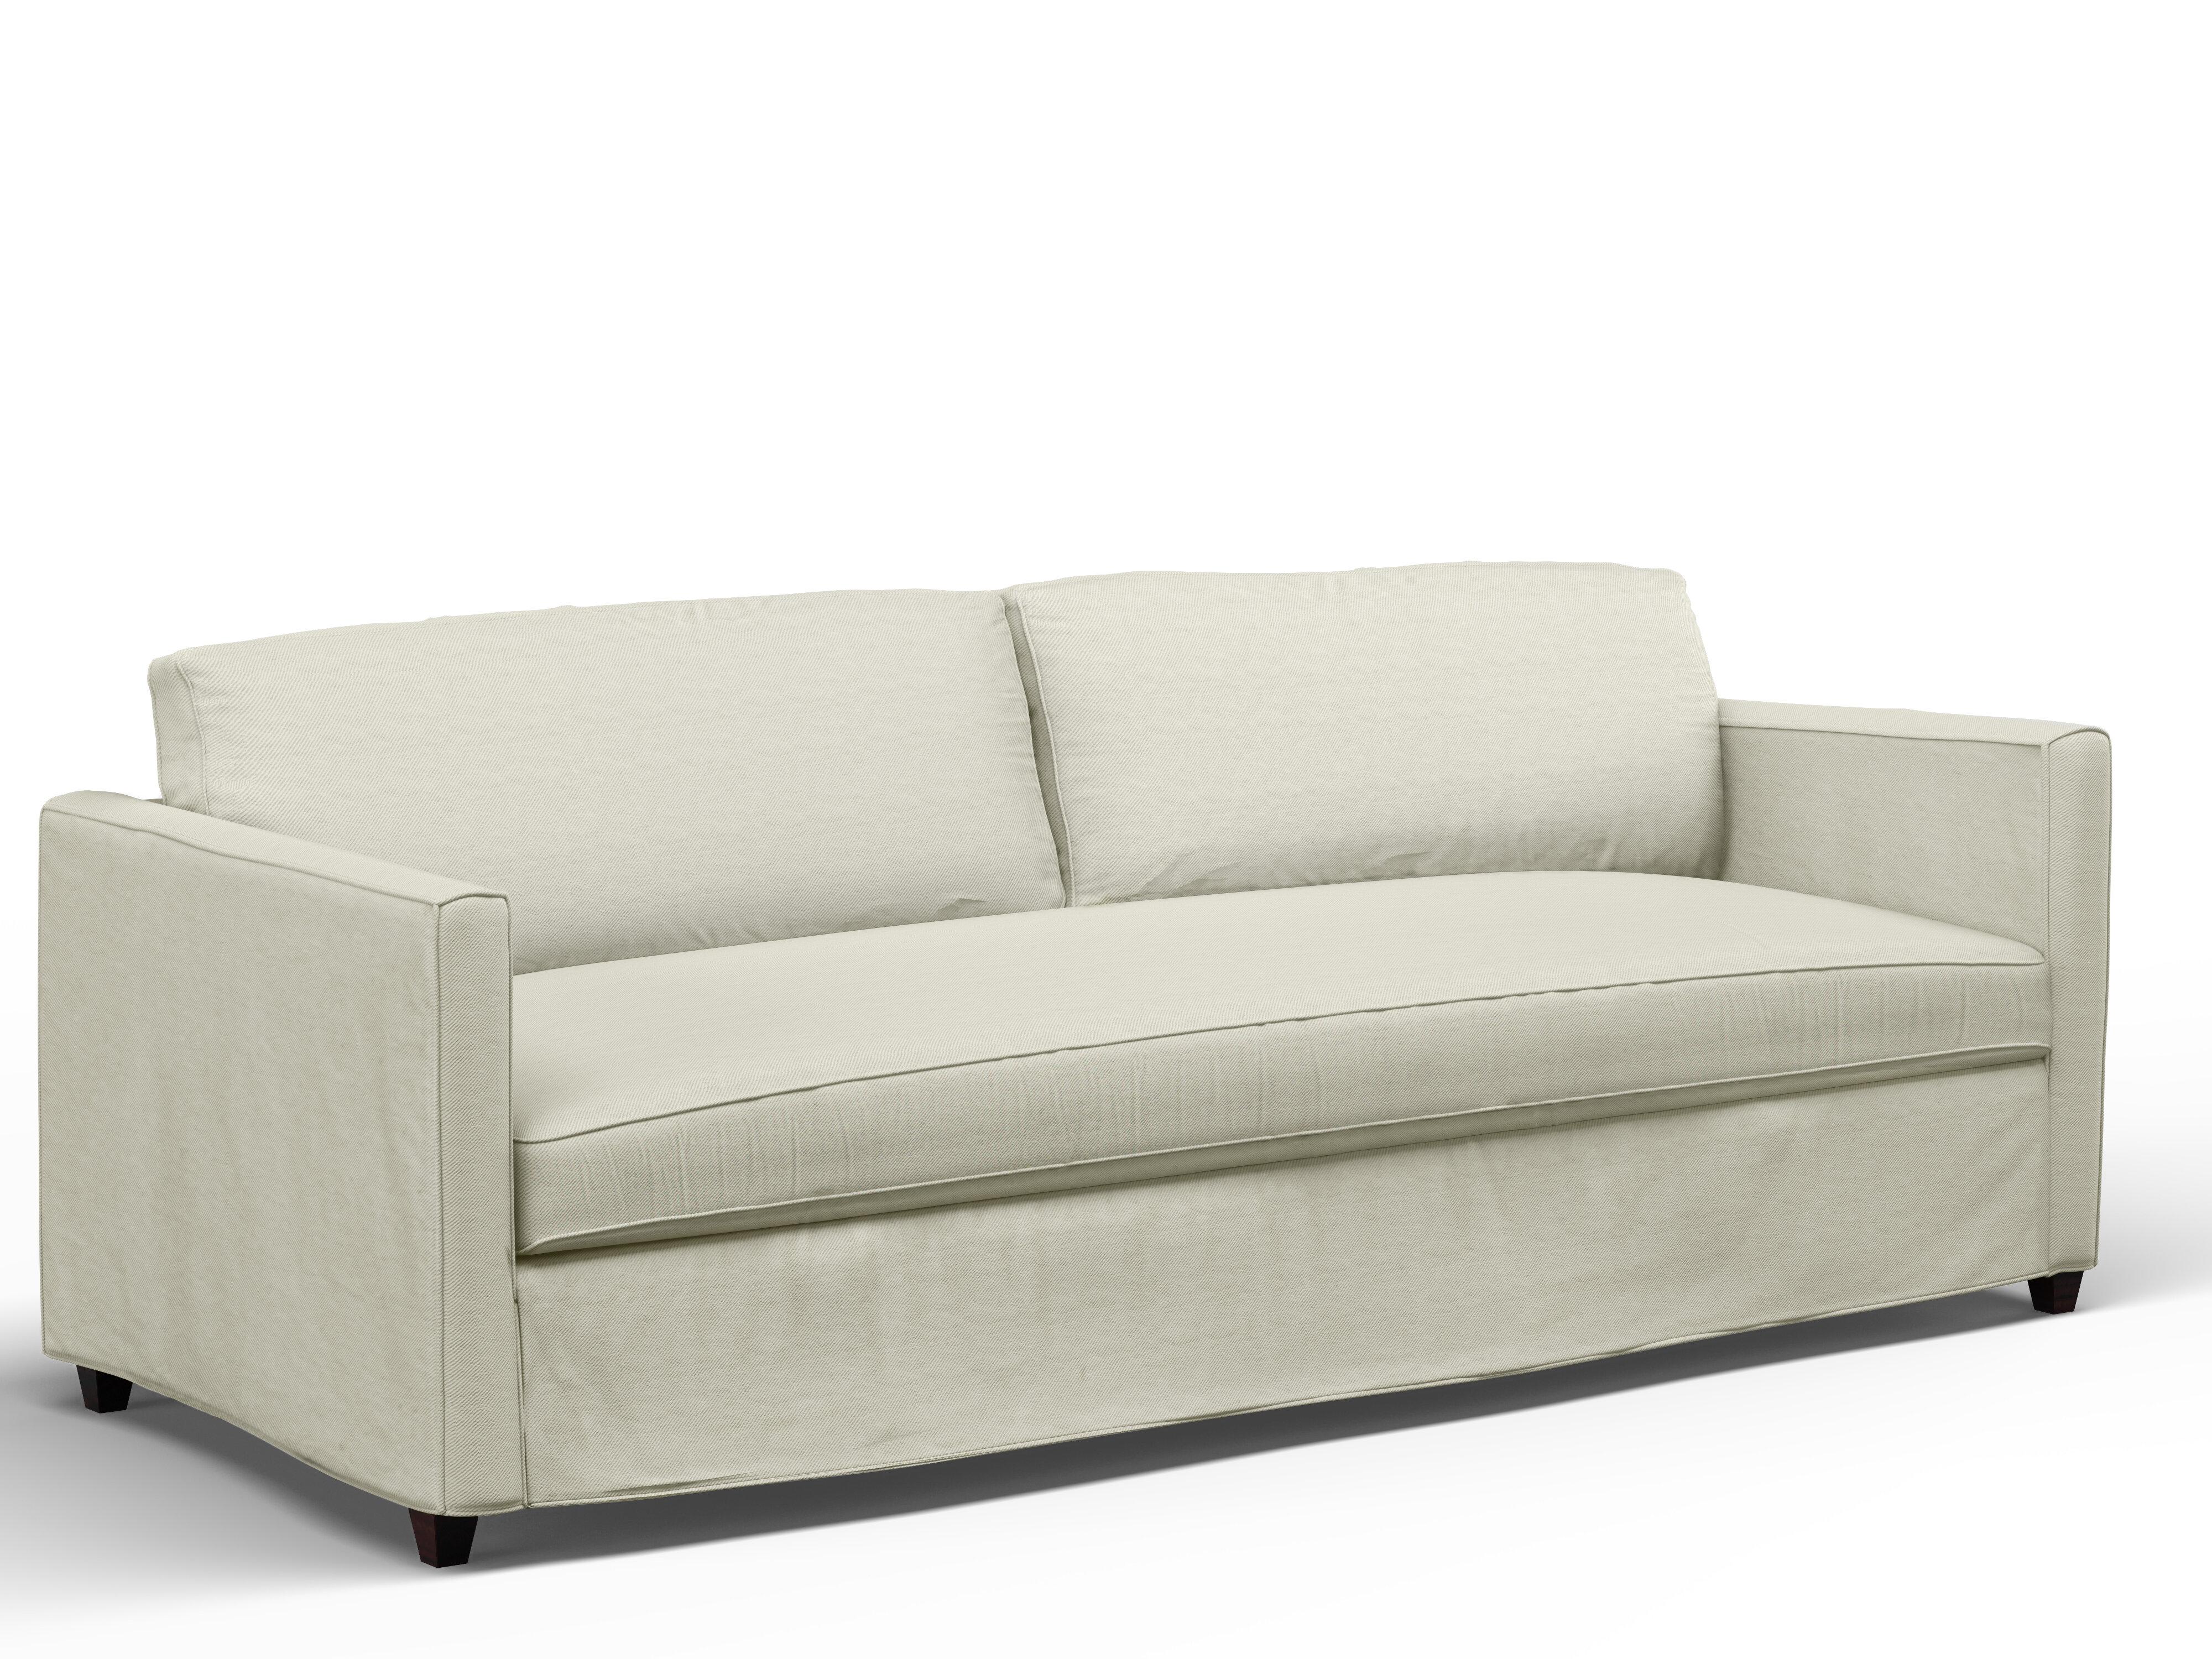 sofas home items slipcover type cream hills rs slipcovered brands detail stowe coventry item lexington sofa